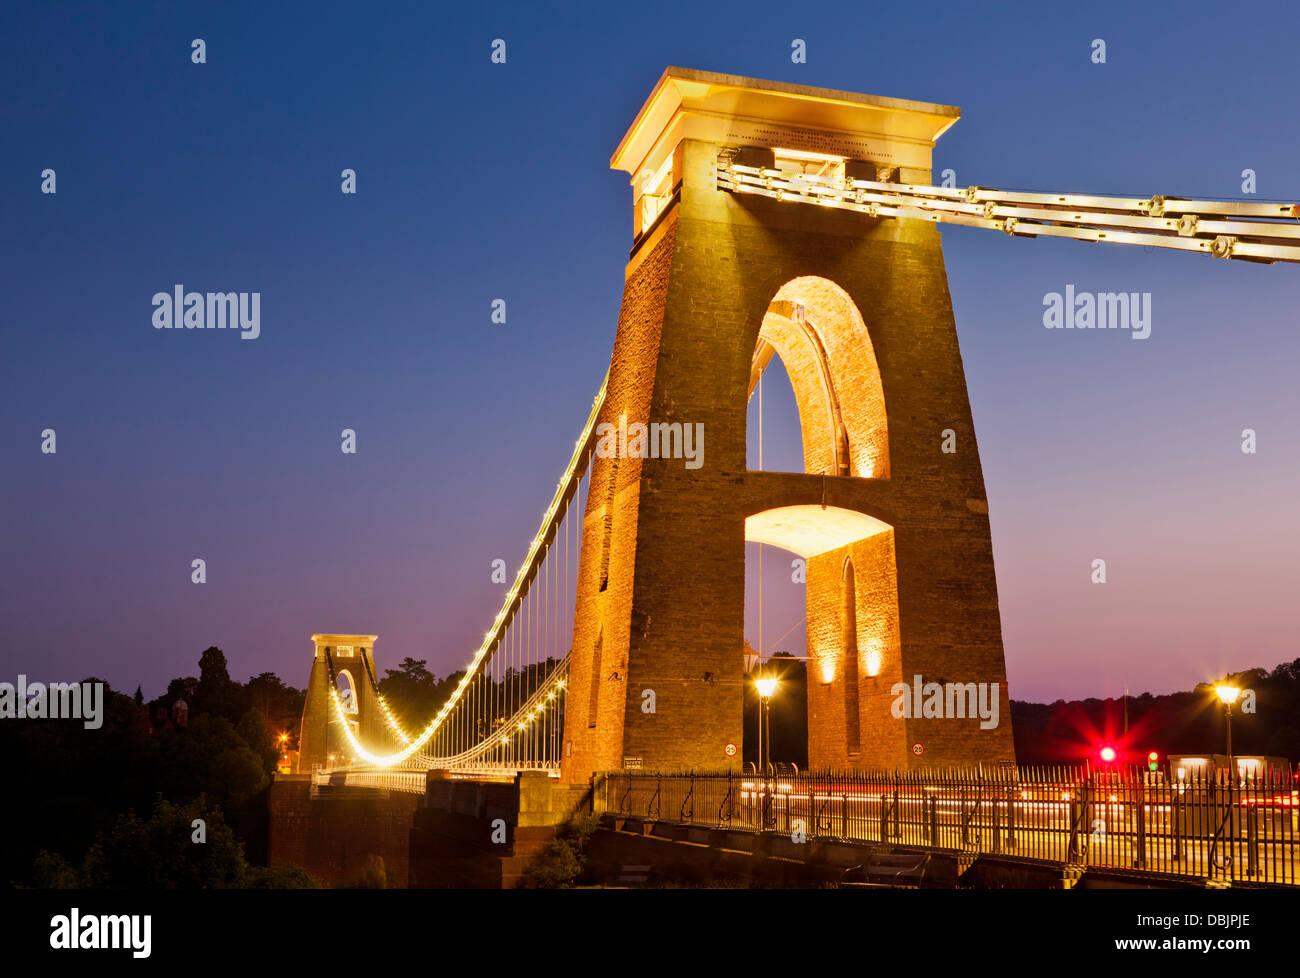 Clifton suspension bridge illuminated at night sunset clifton downs Bristol Avon England UK GB EU Europe - Stock Image